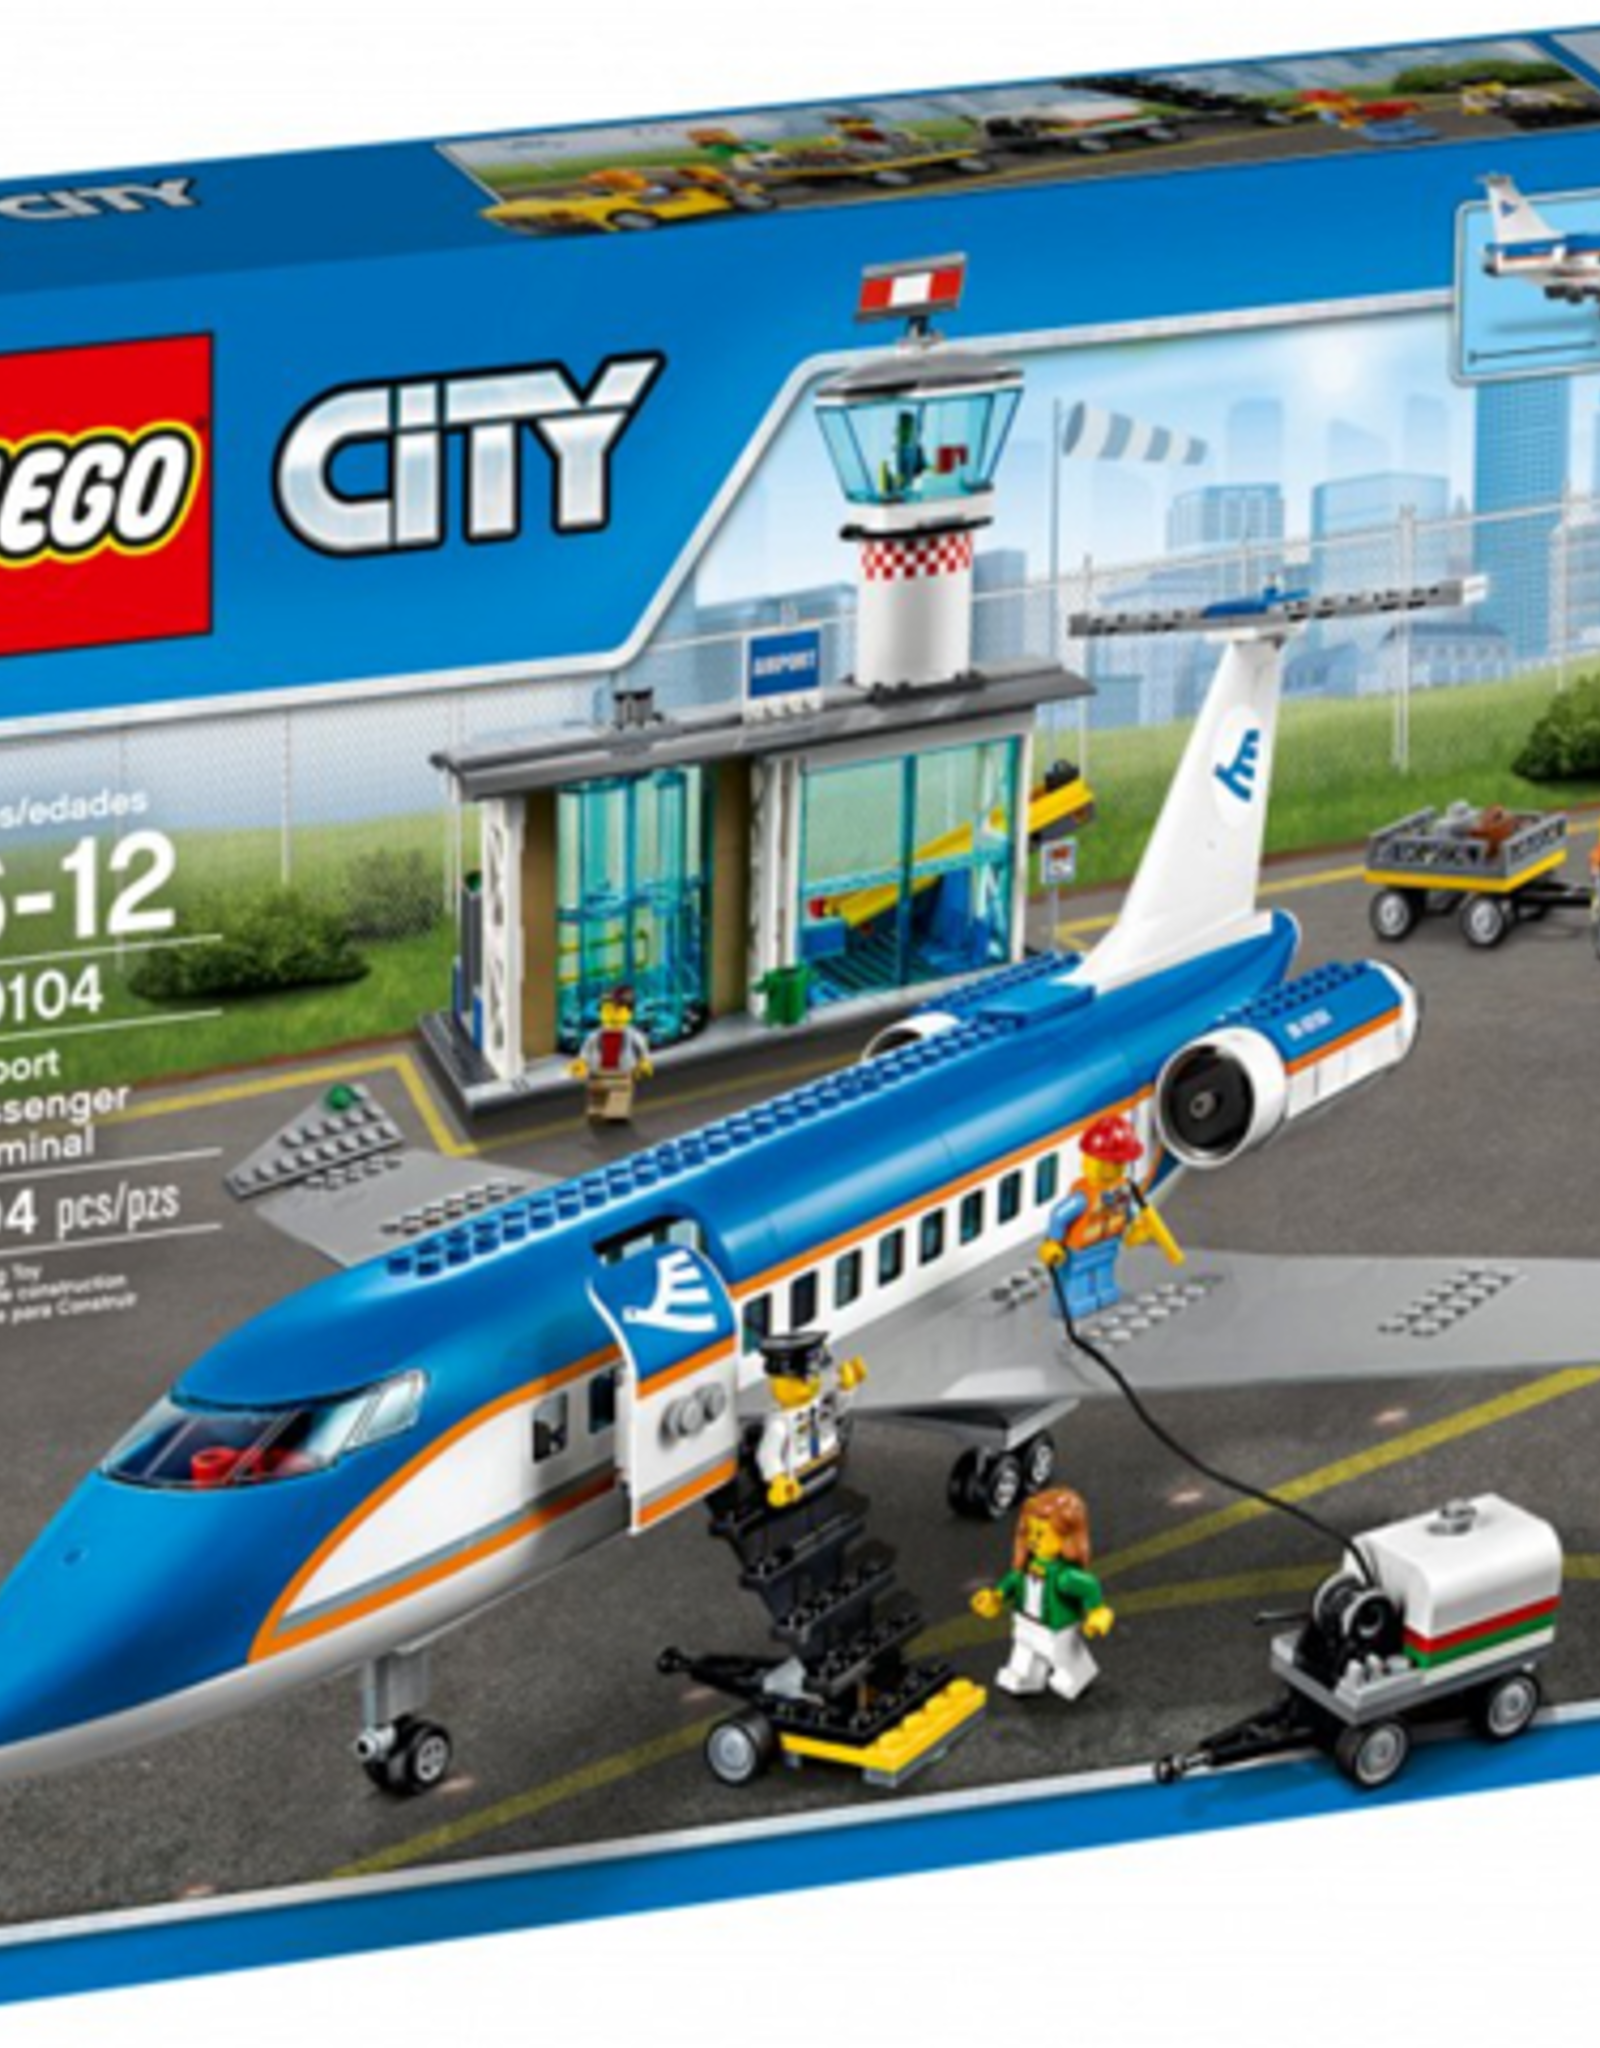 LEGO LEGO 60104 Airport Passenger Terminal CITY